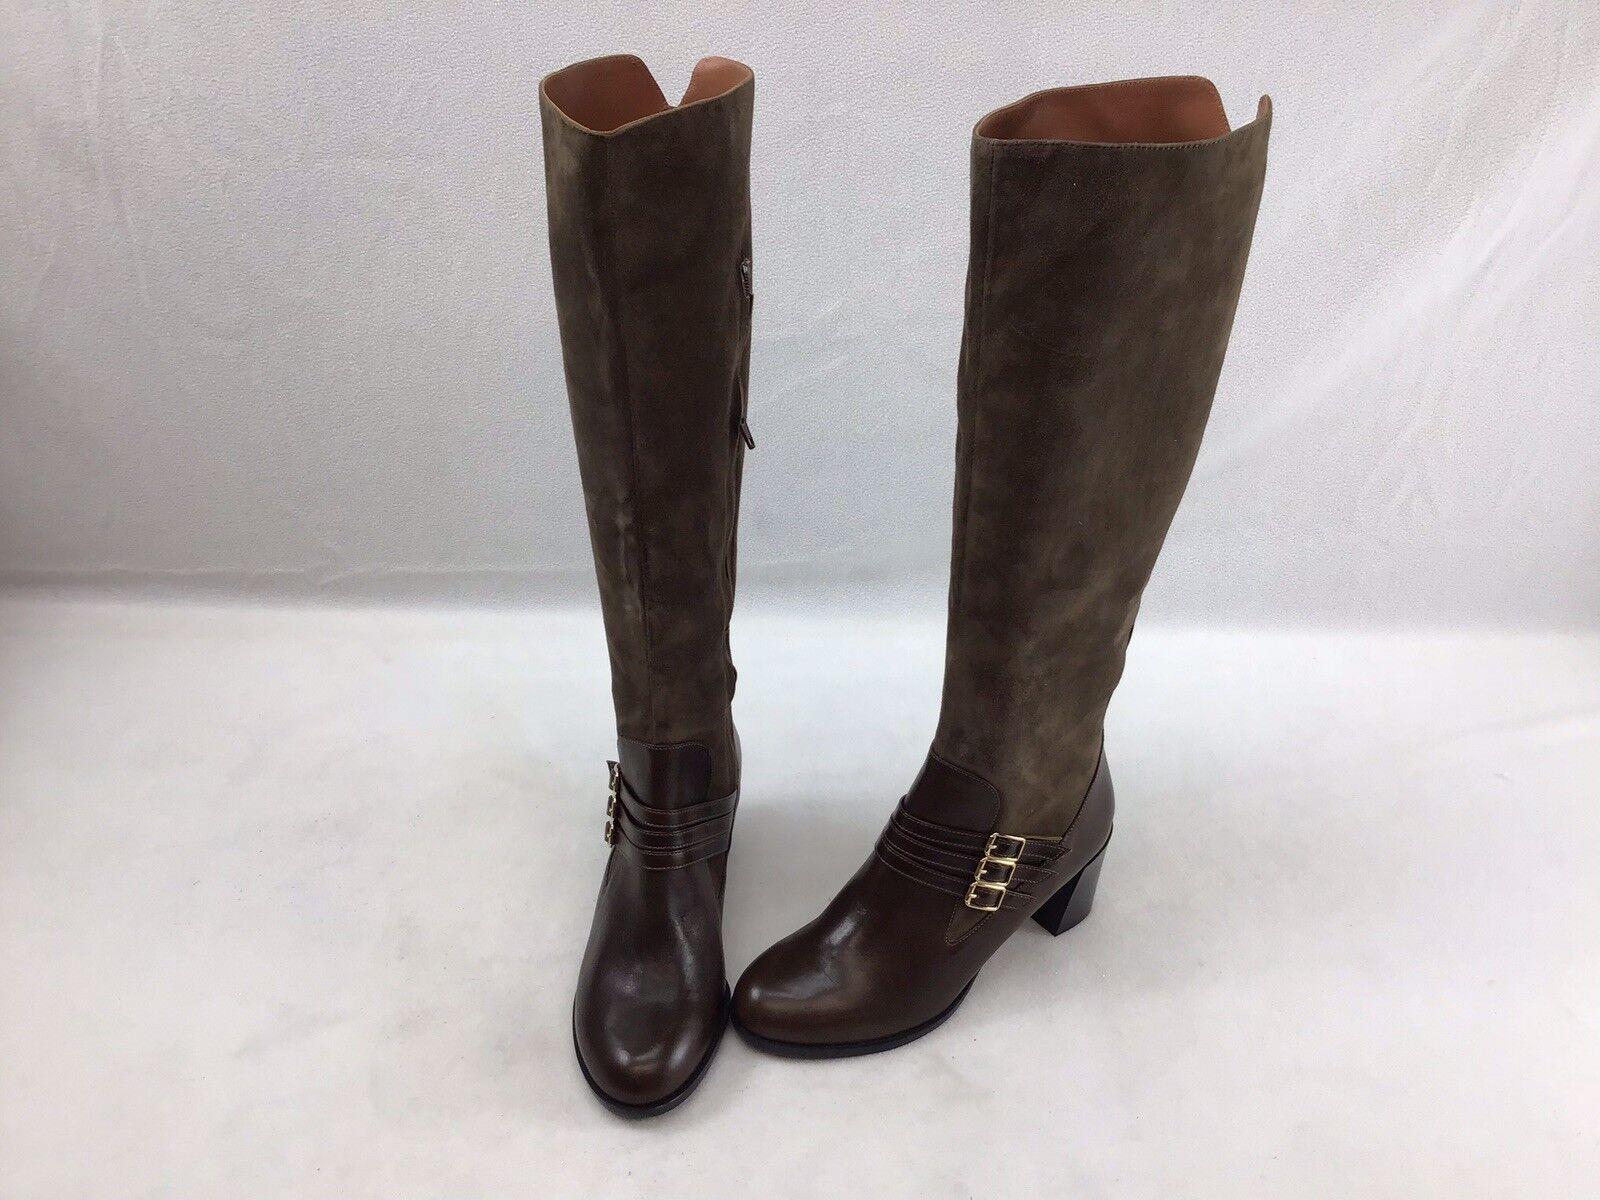 Derek Lam Side Zip Brown Suede Knee Boots Size 7B  F2236